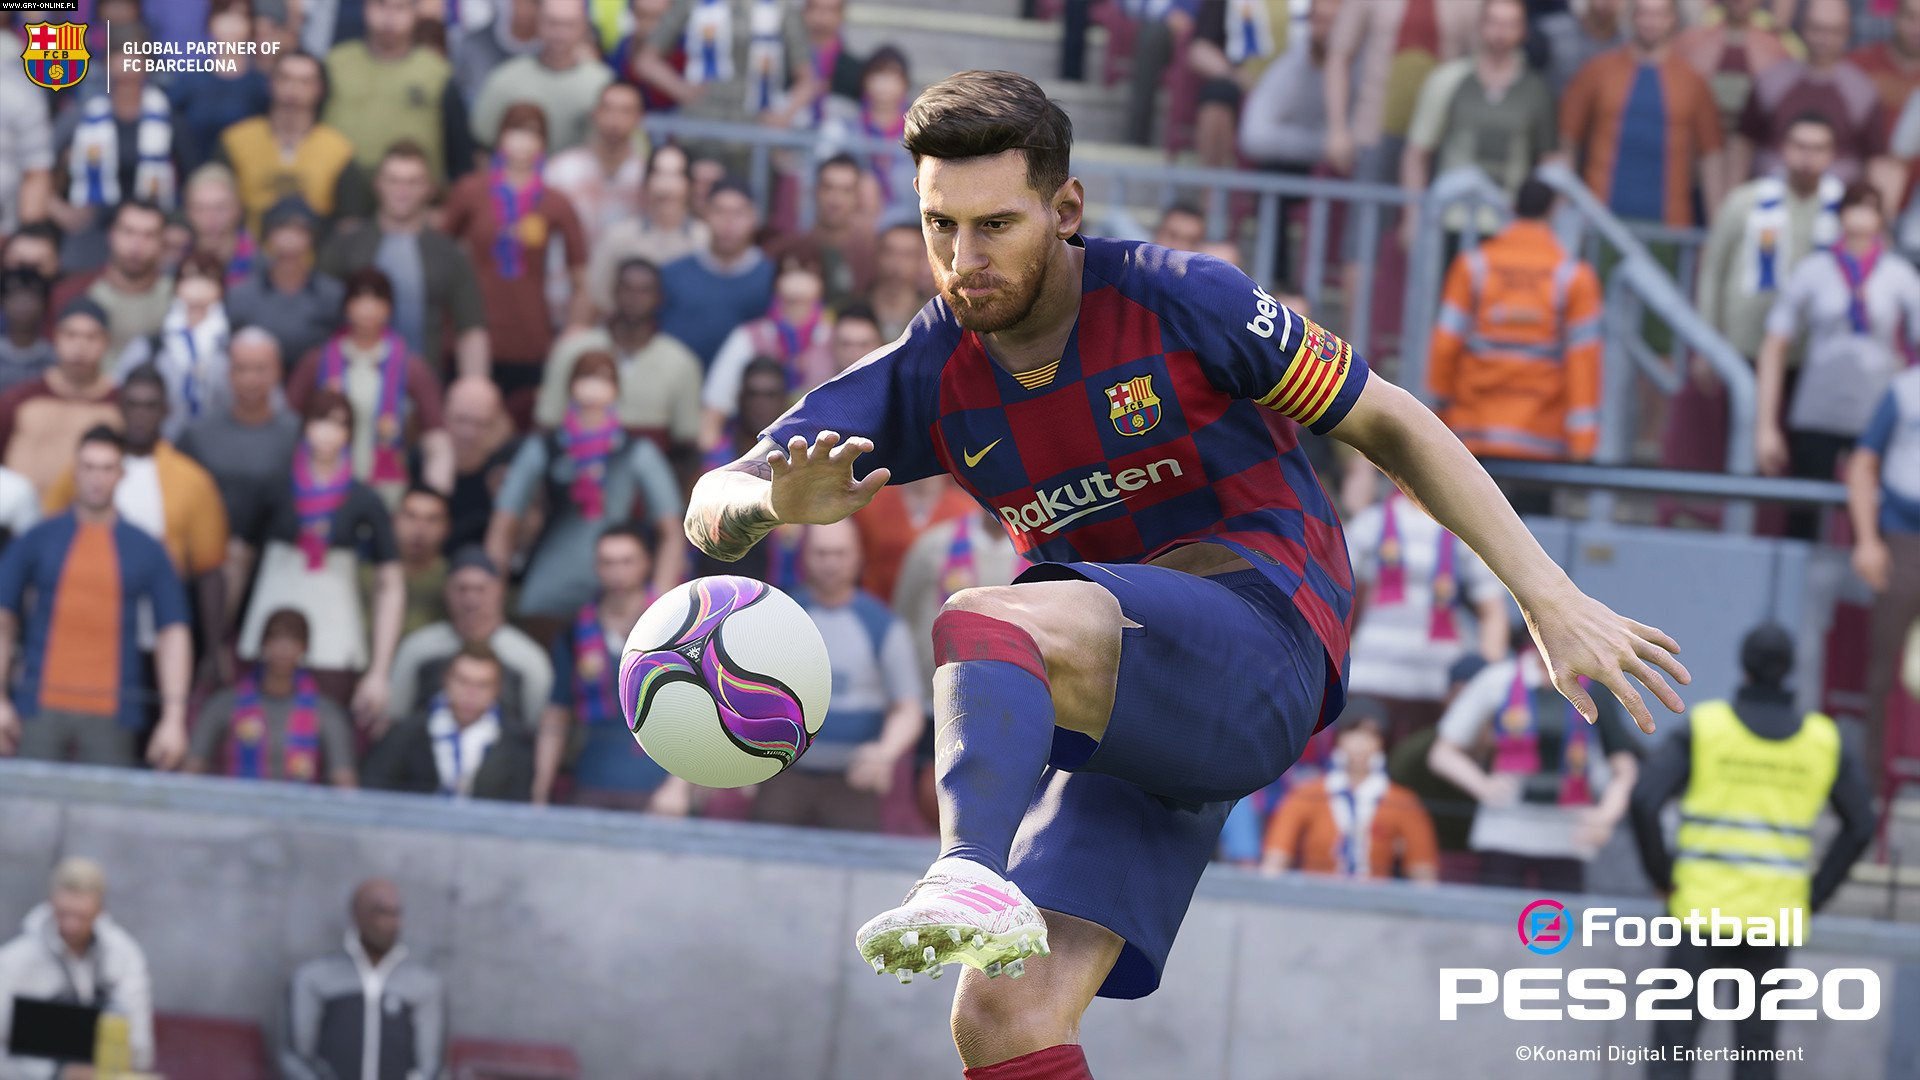 eFootball PES 2020 PC, PS4, XONE Games Image 1/25, Konami